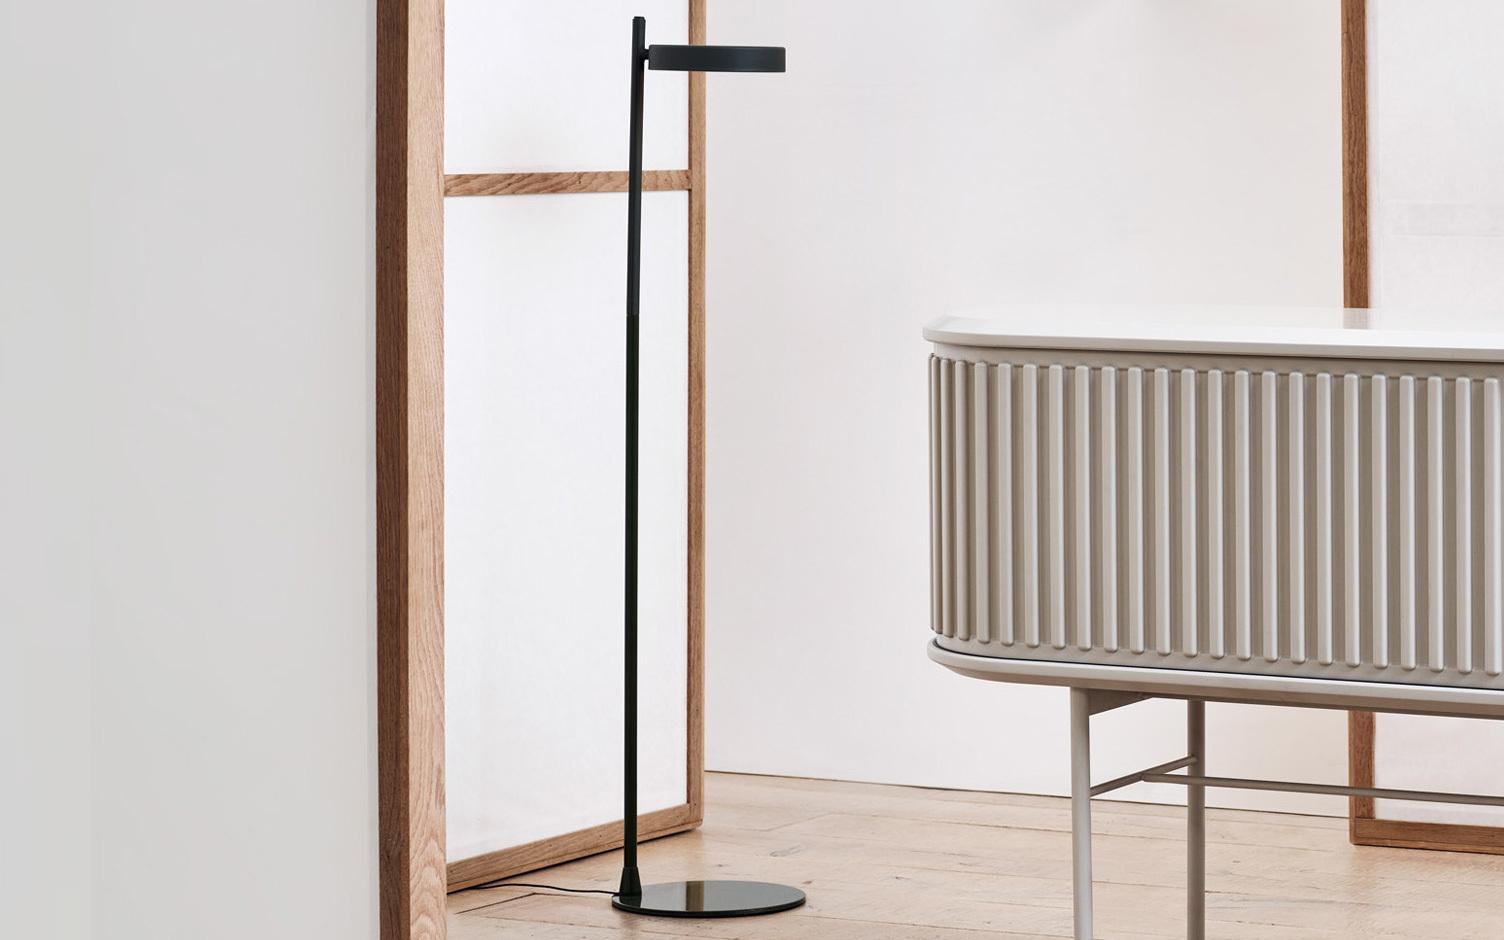 Floor Lamps catalogue image